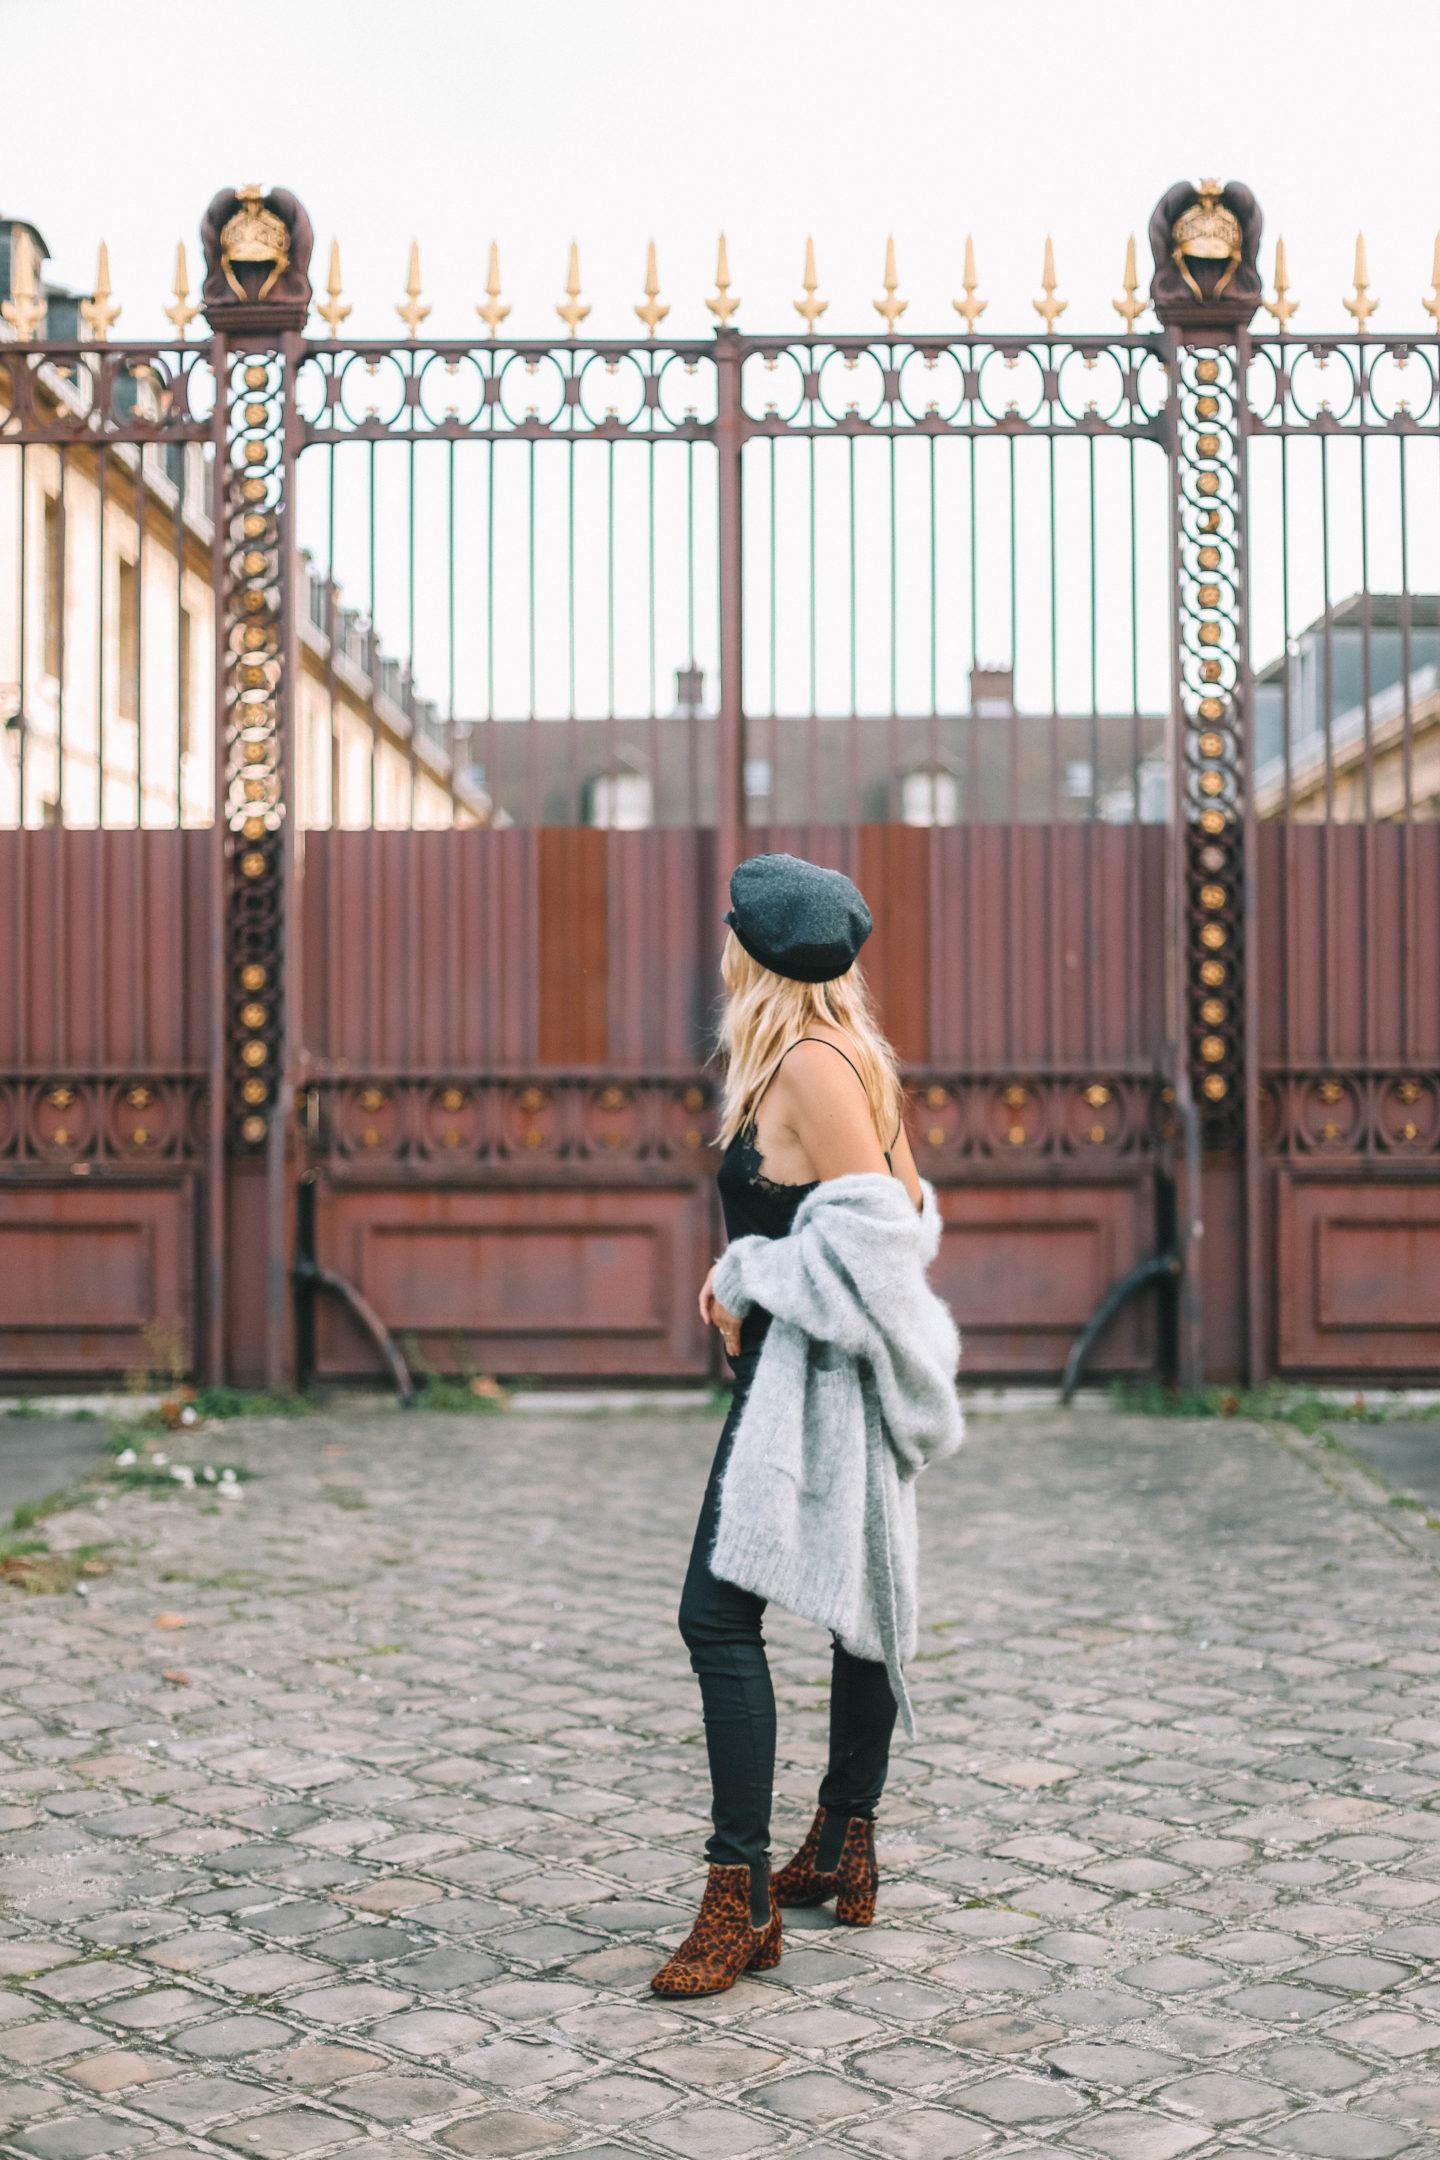 Gilet en laine American Vintage - Blondie baby blog mode et voyages